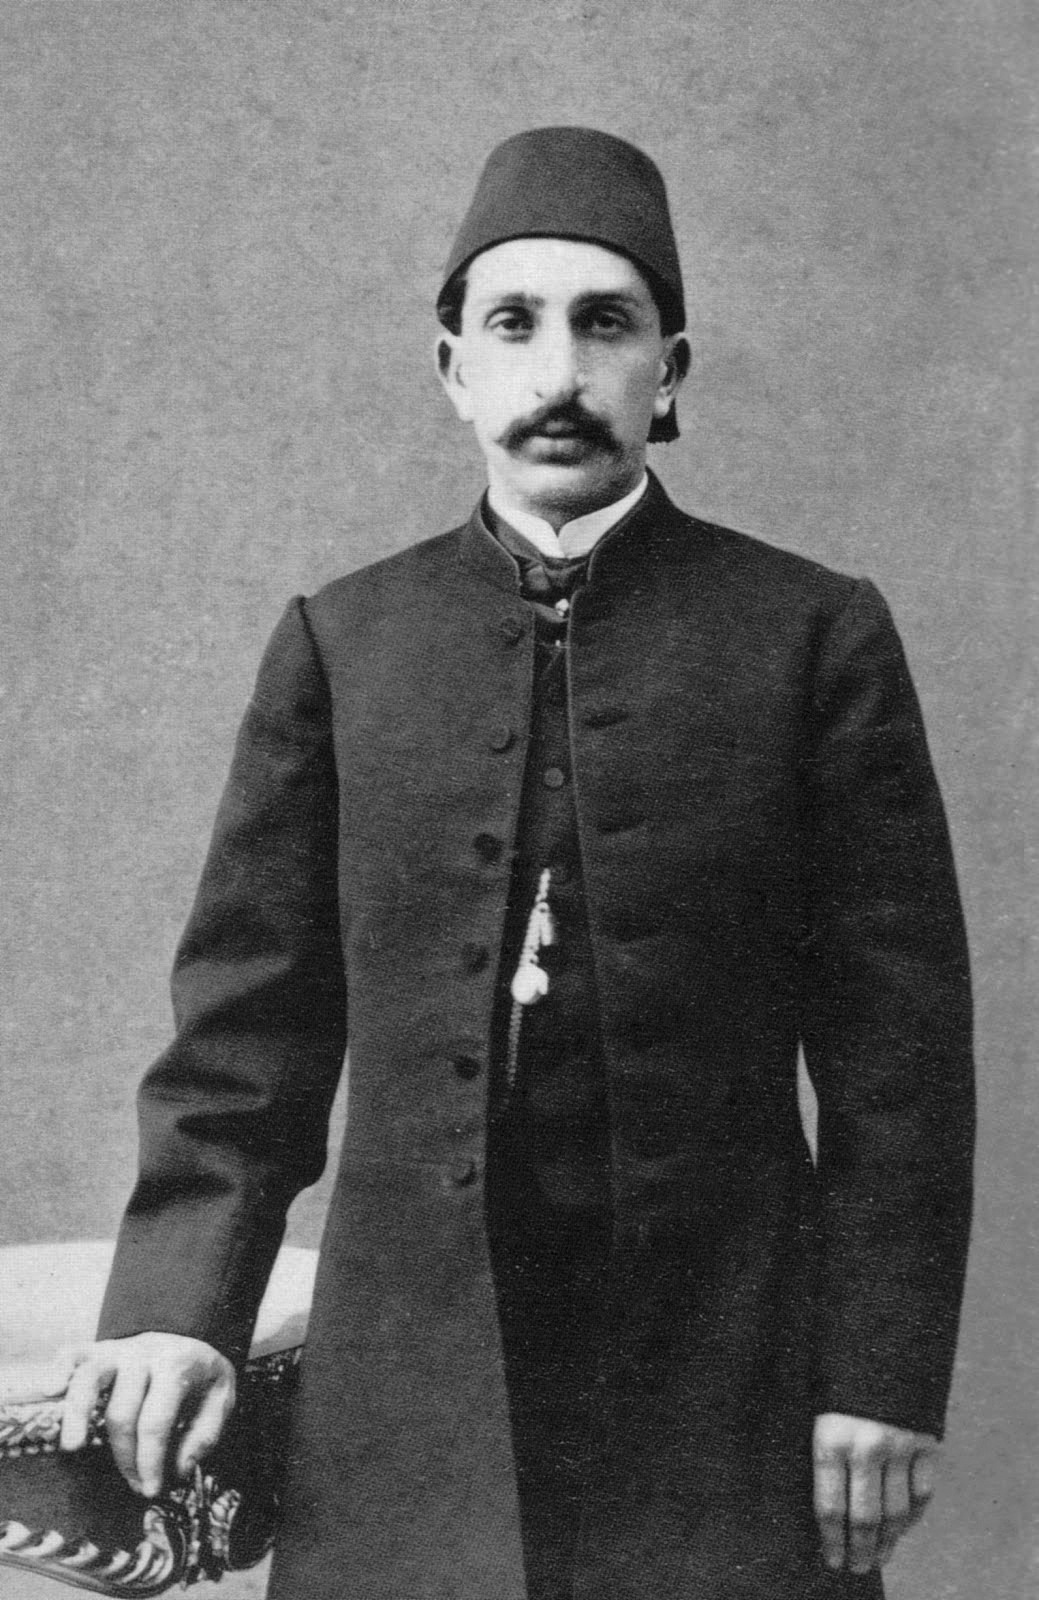 Sultan Abdul Hamid II Net Worth